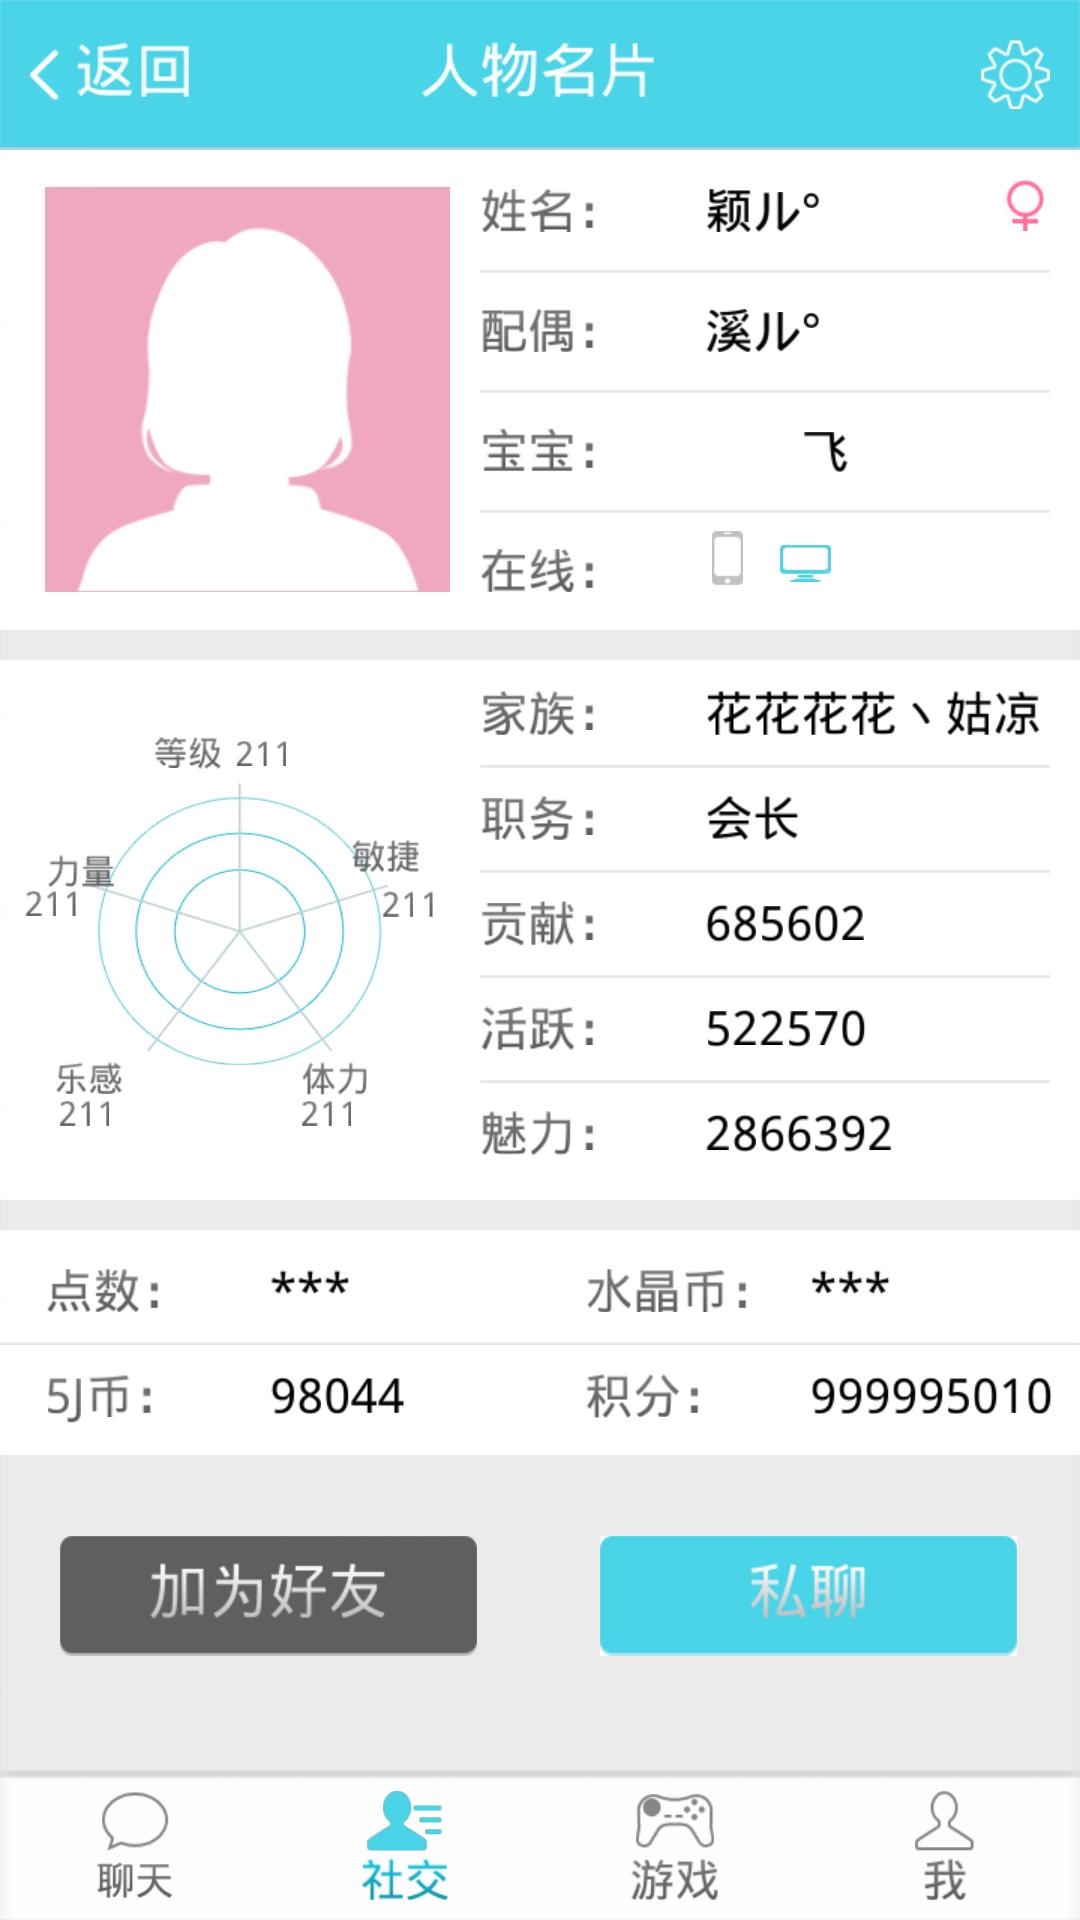 Screenshot_2015-09-23-16-36-28.png